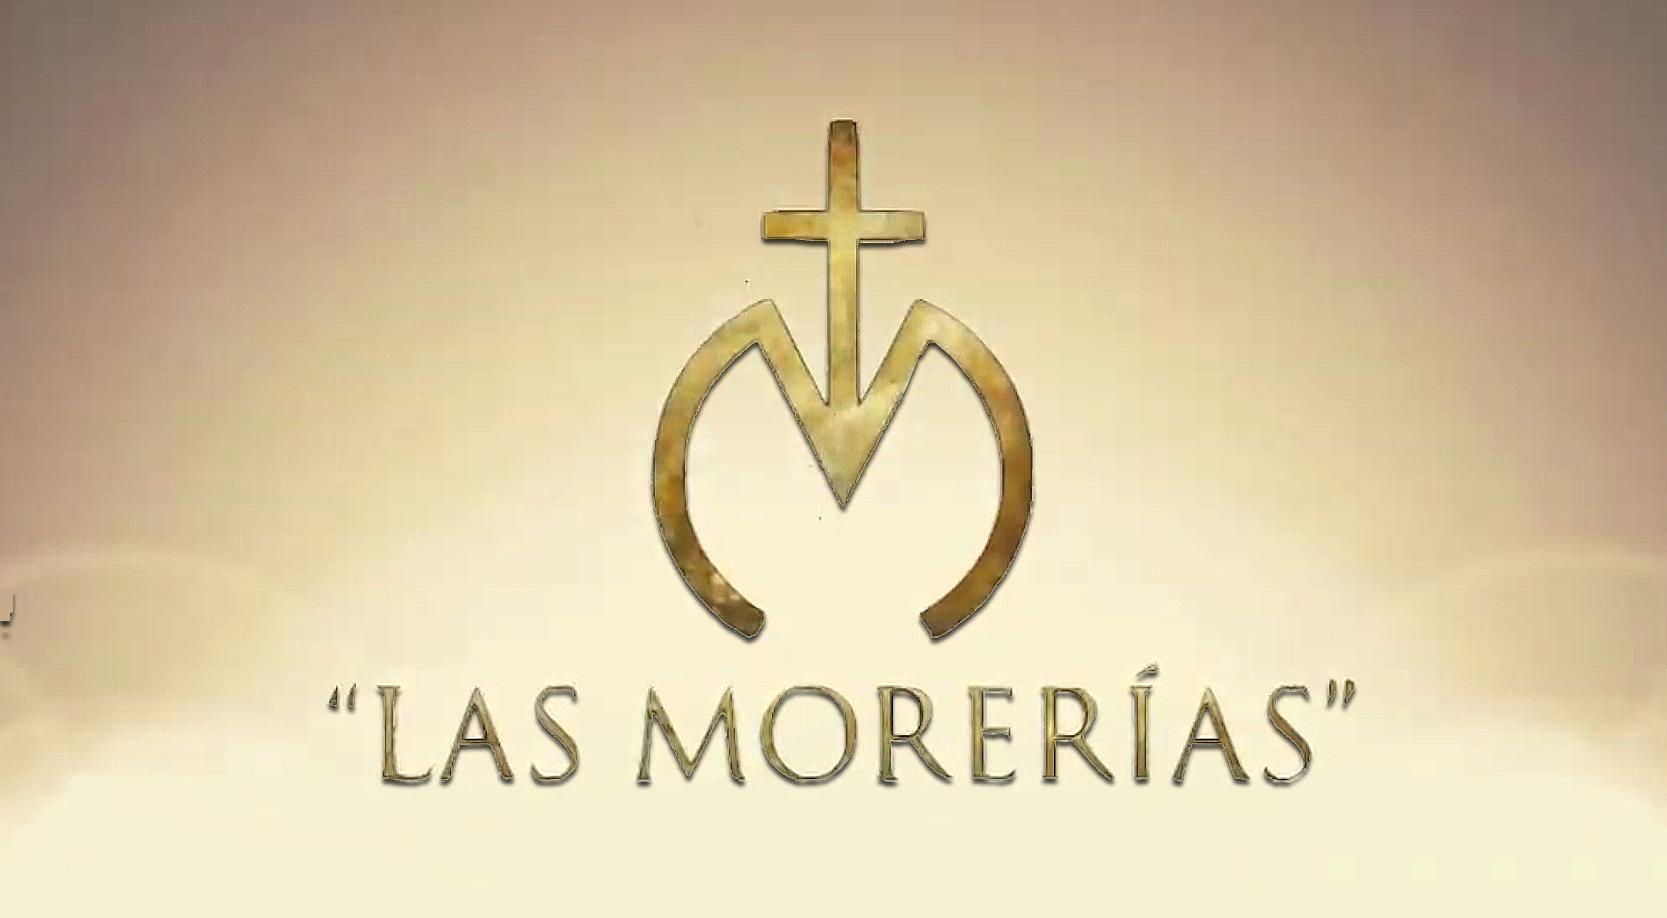 LAS MORERÍAS, LISTOS PARA SICAB 2019